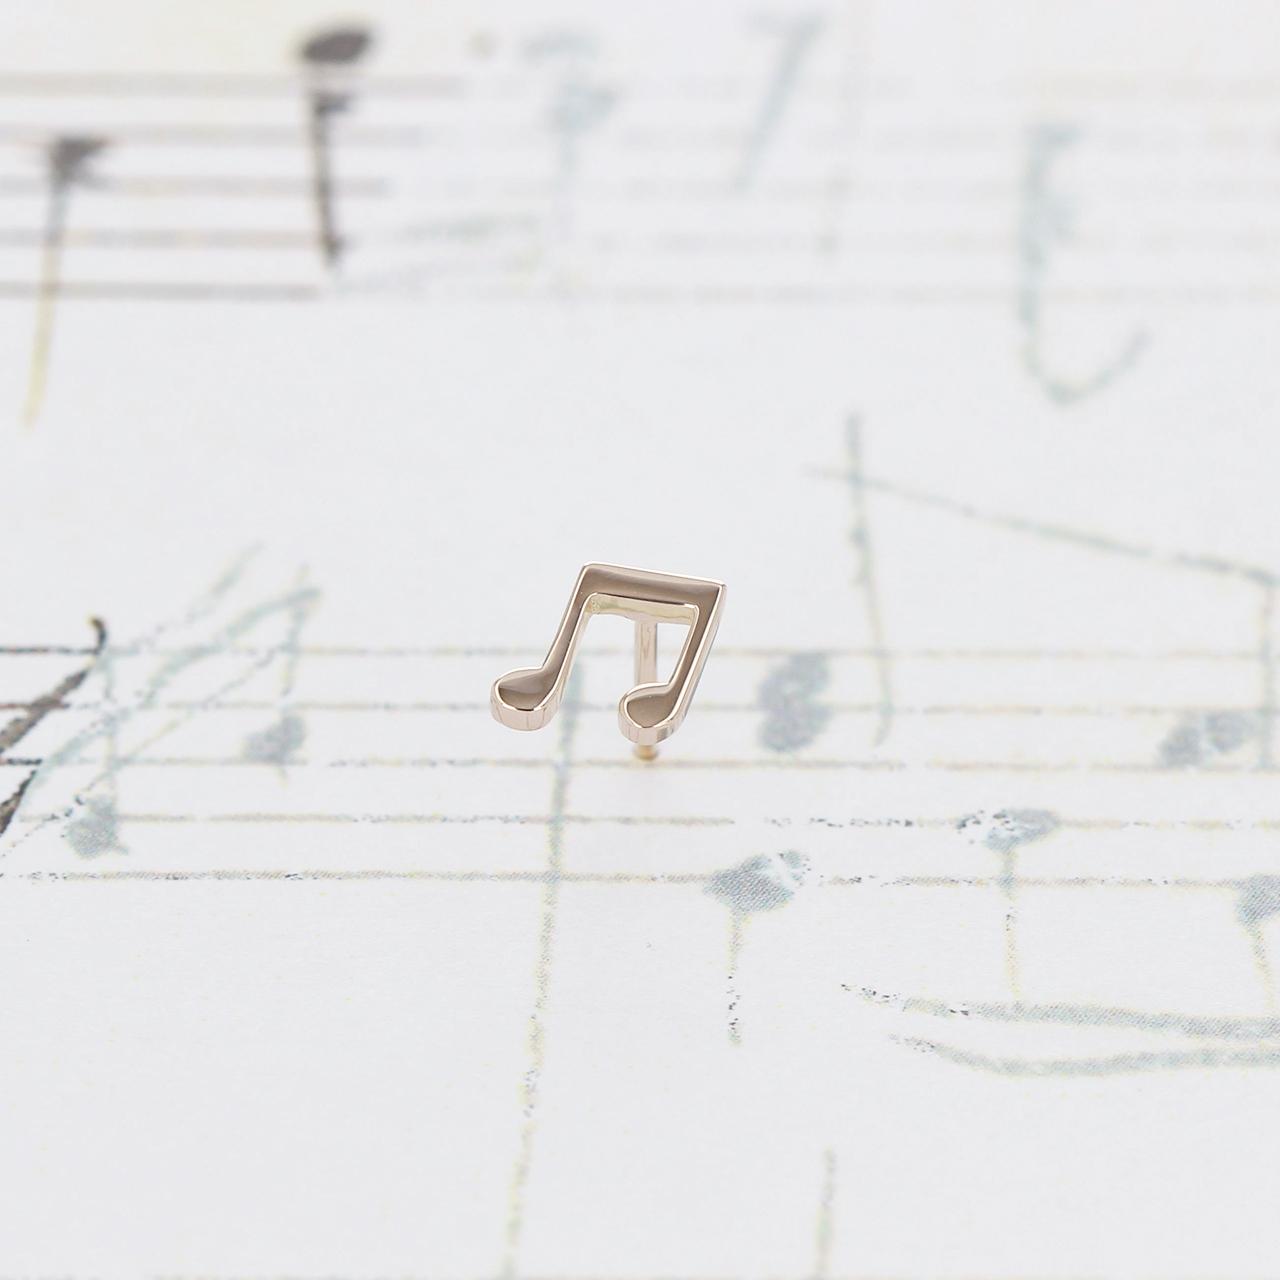 K10 / ピアス (片耳) / 連桁付き8分音符スタッドピアス